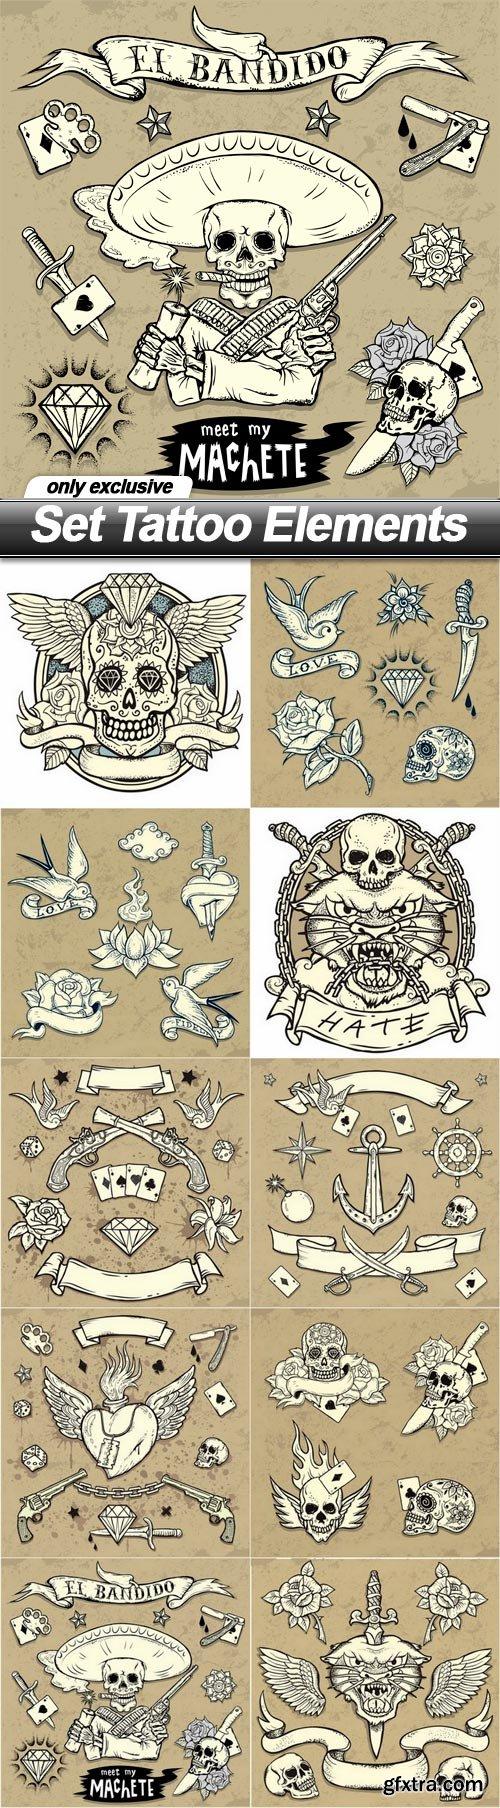 Set Tattoo Elements - 10 EPS